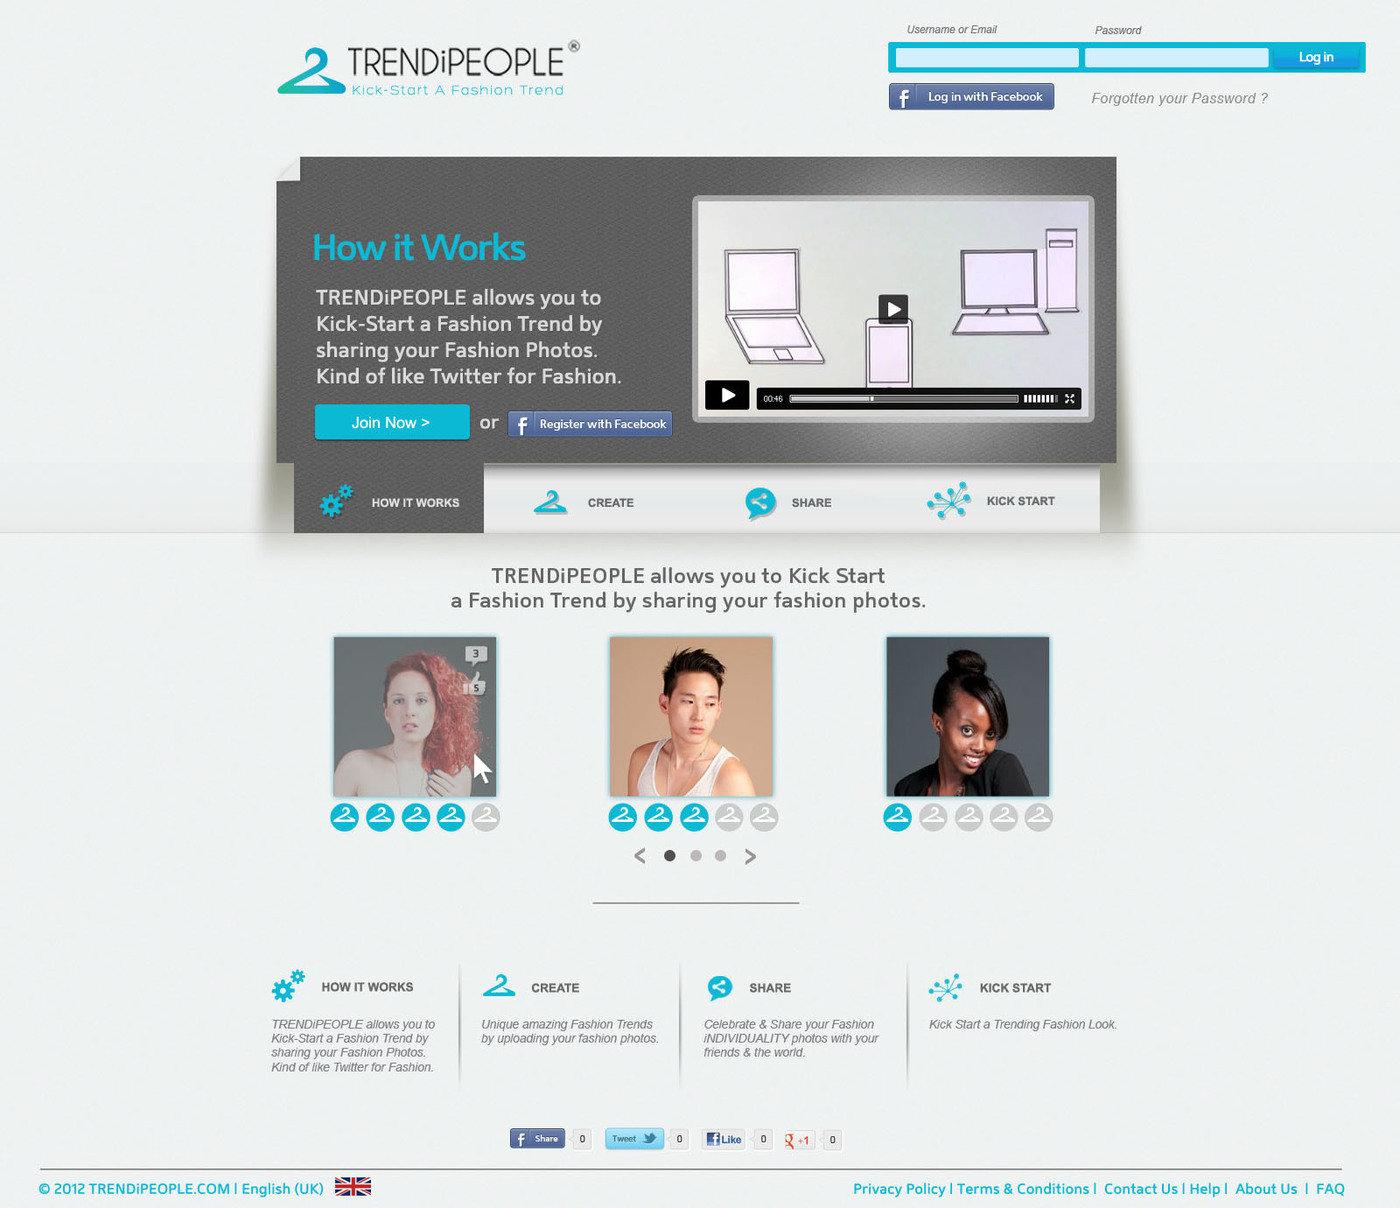 TRENDiPEOPLE - GUI Design by Michael Padua at Coroflot com